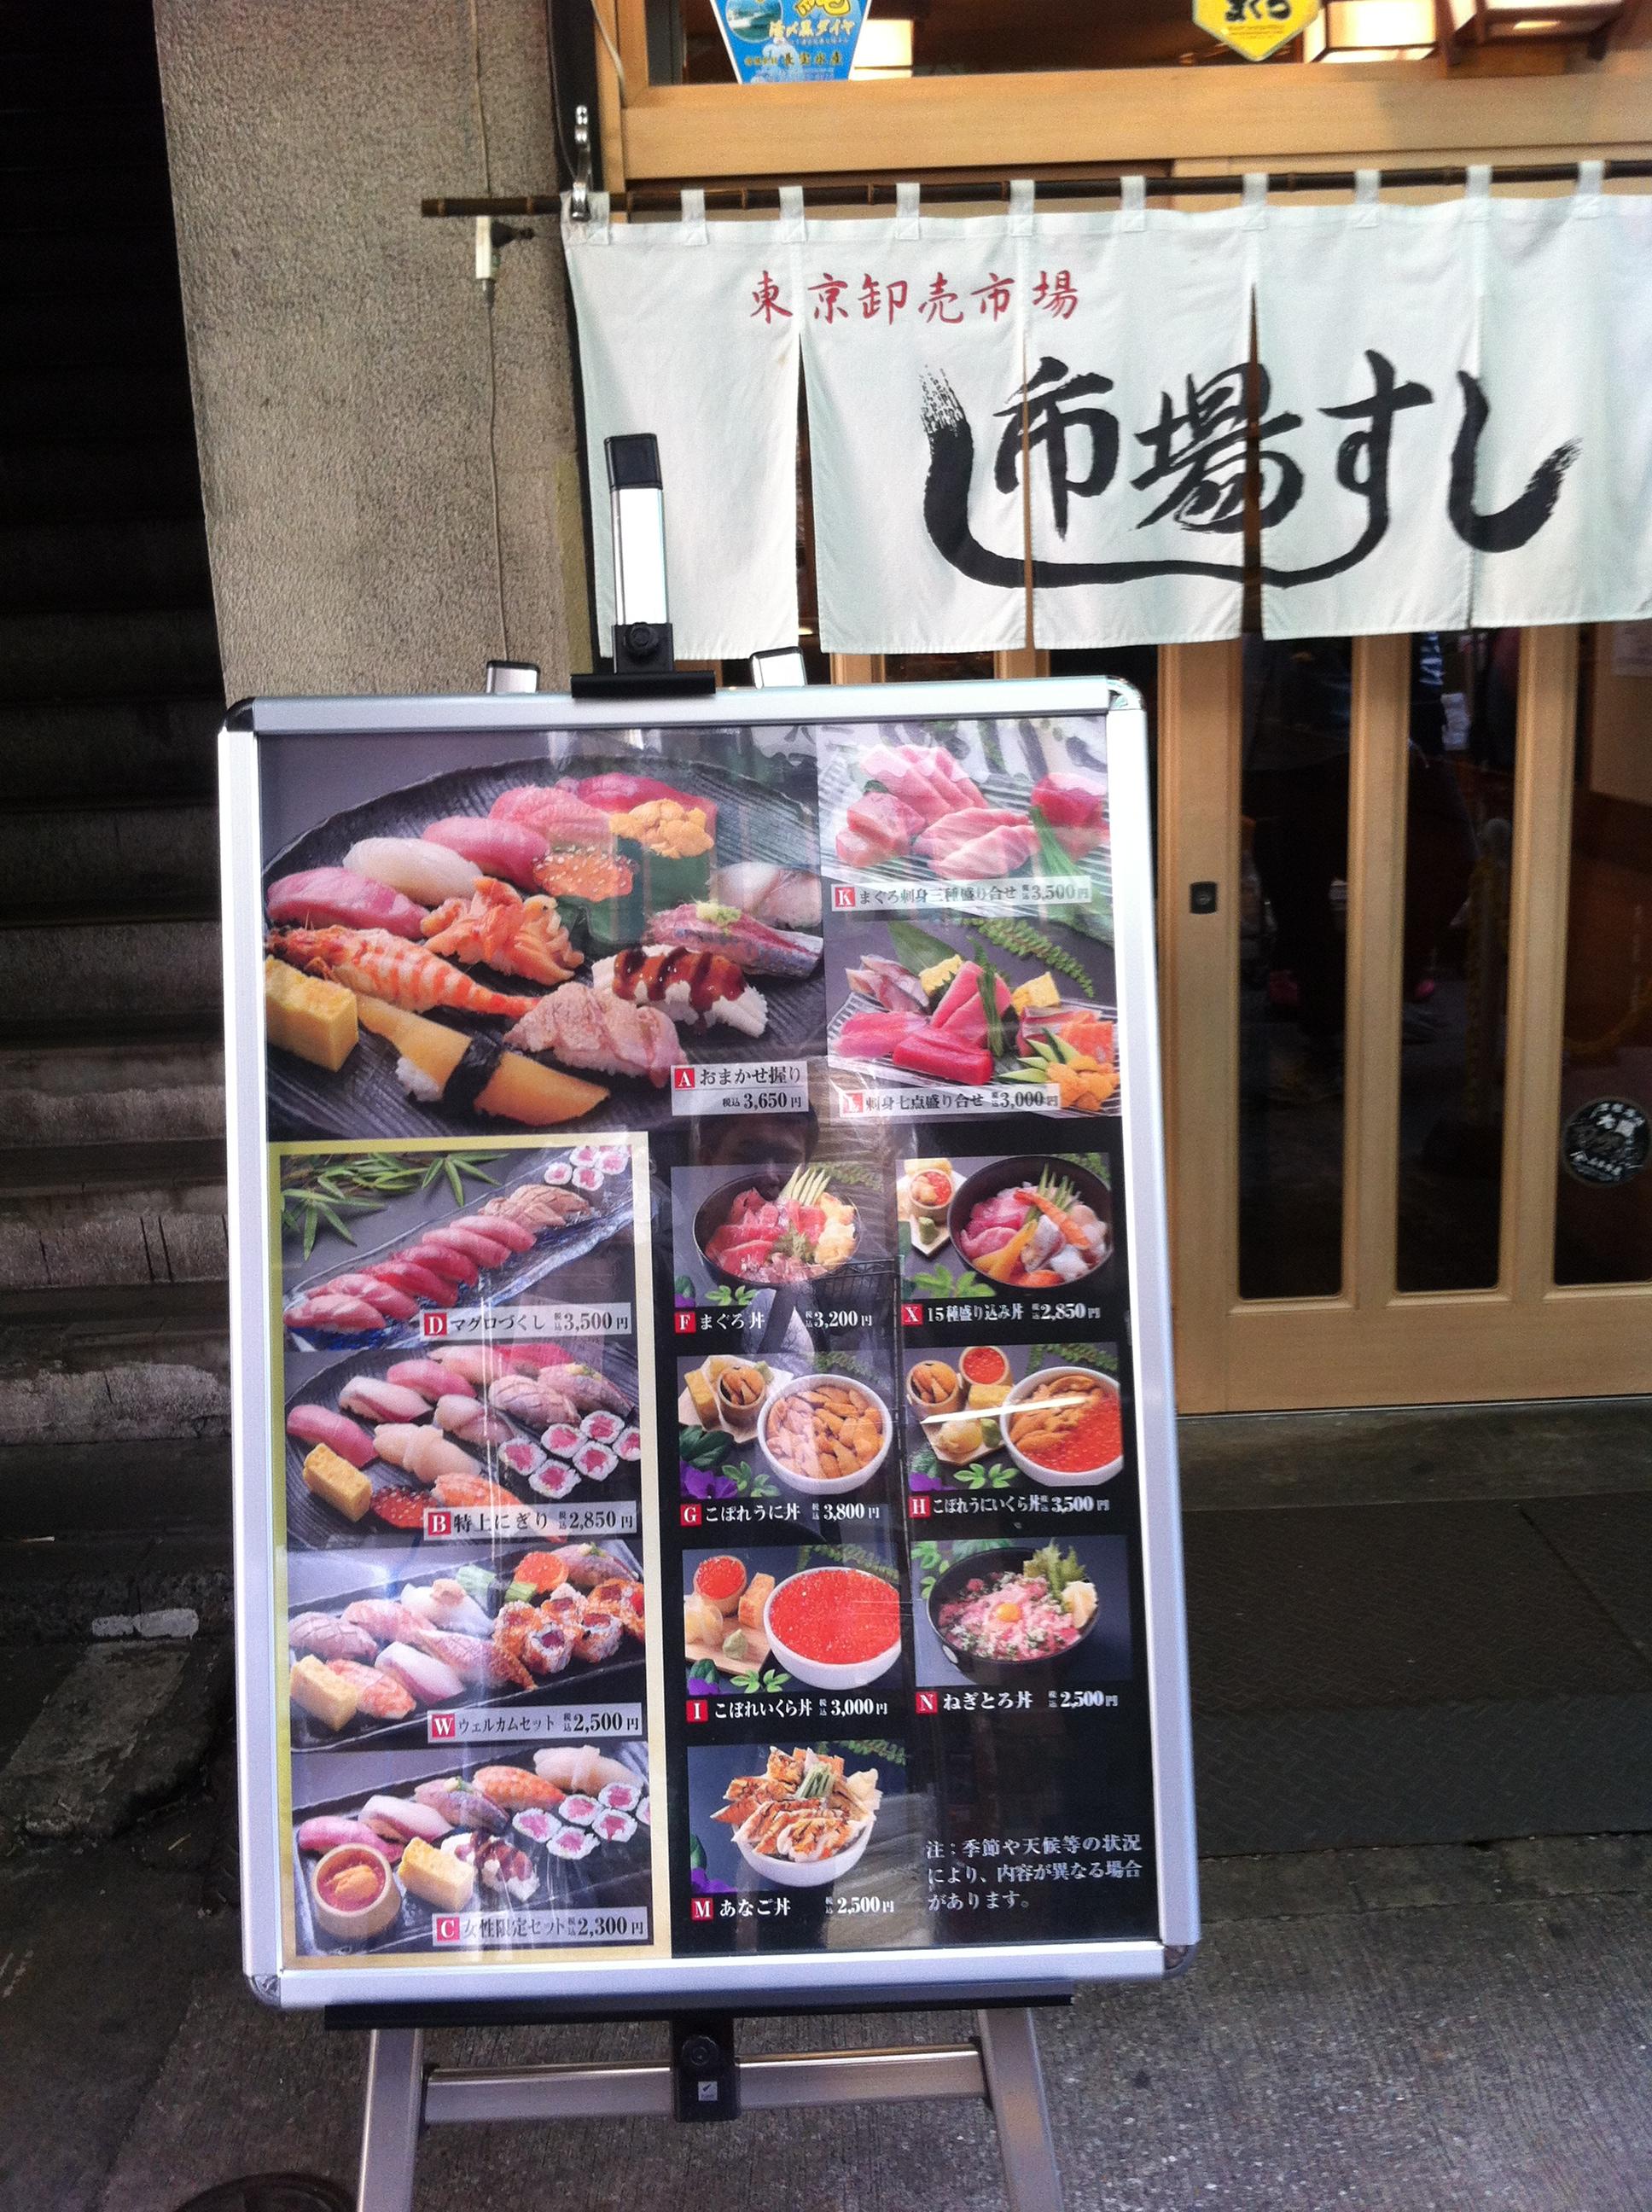 Picture 339เที่ยวญี่ปุ่น,เที่ยวโตเกียว,โรงแรมญี่ปุ่น,โรงแรมโตเกียว,แนะนำที่เที่ยวนิยม,ที่พักราคาถูกโตเกียว,ราคาถูกญี่ปุ่น,ราคารถไฟฟ้าญี่ปุ่น,